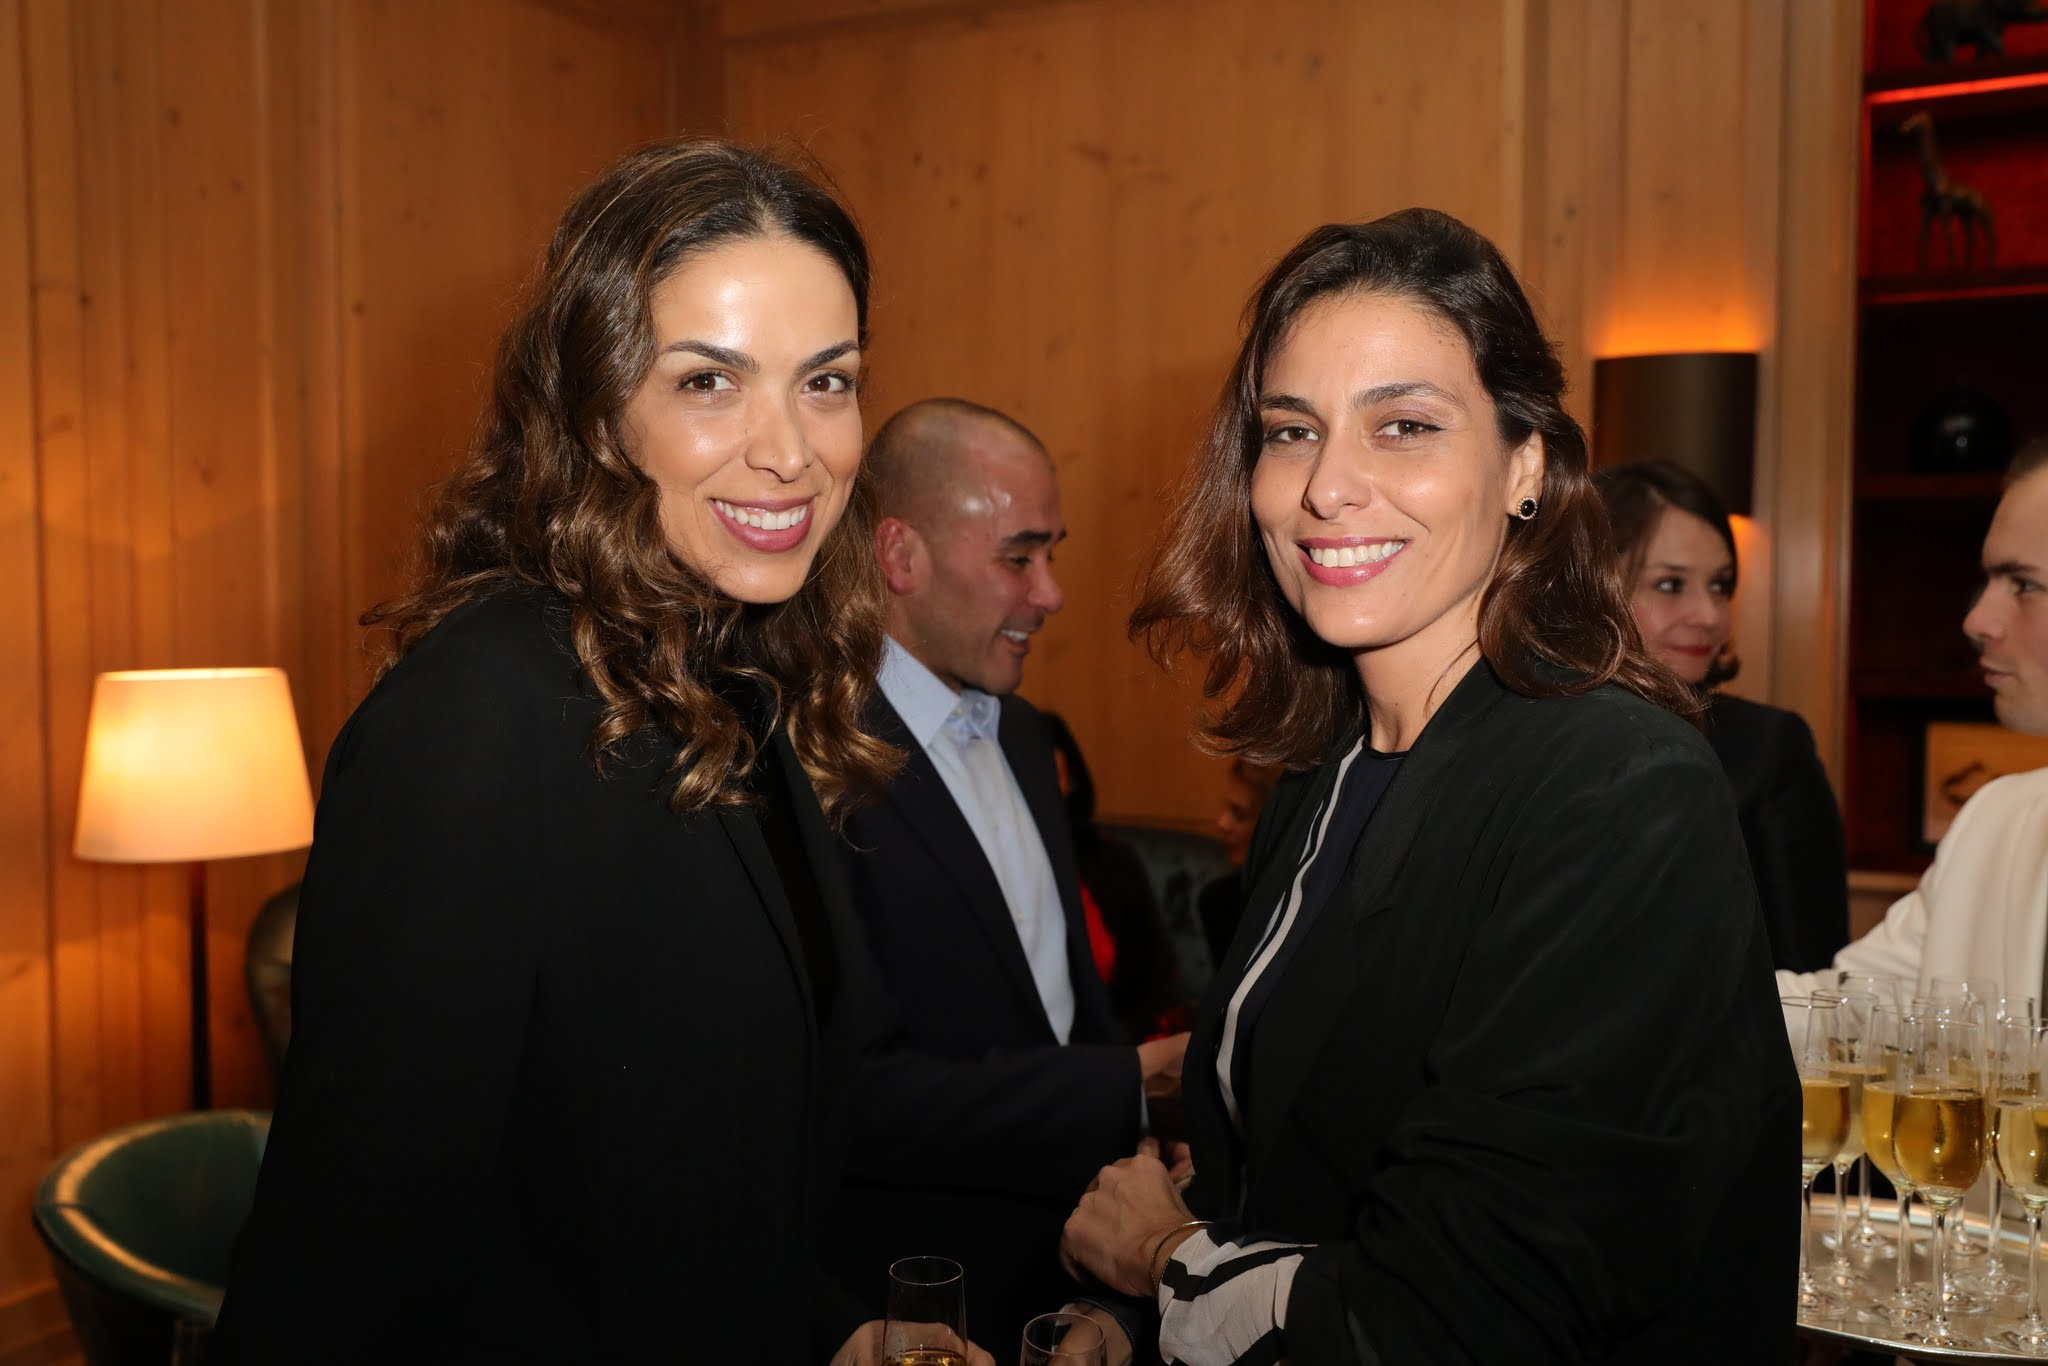 Taciana Veloso e Maria Rita Alonso